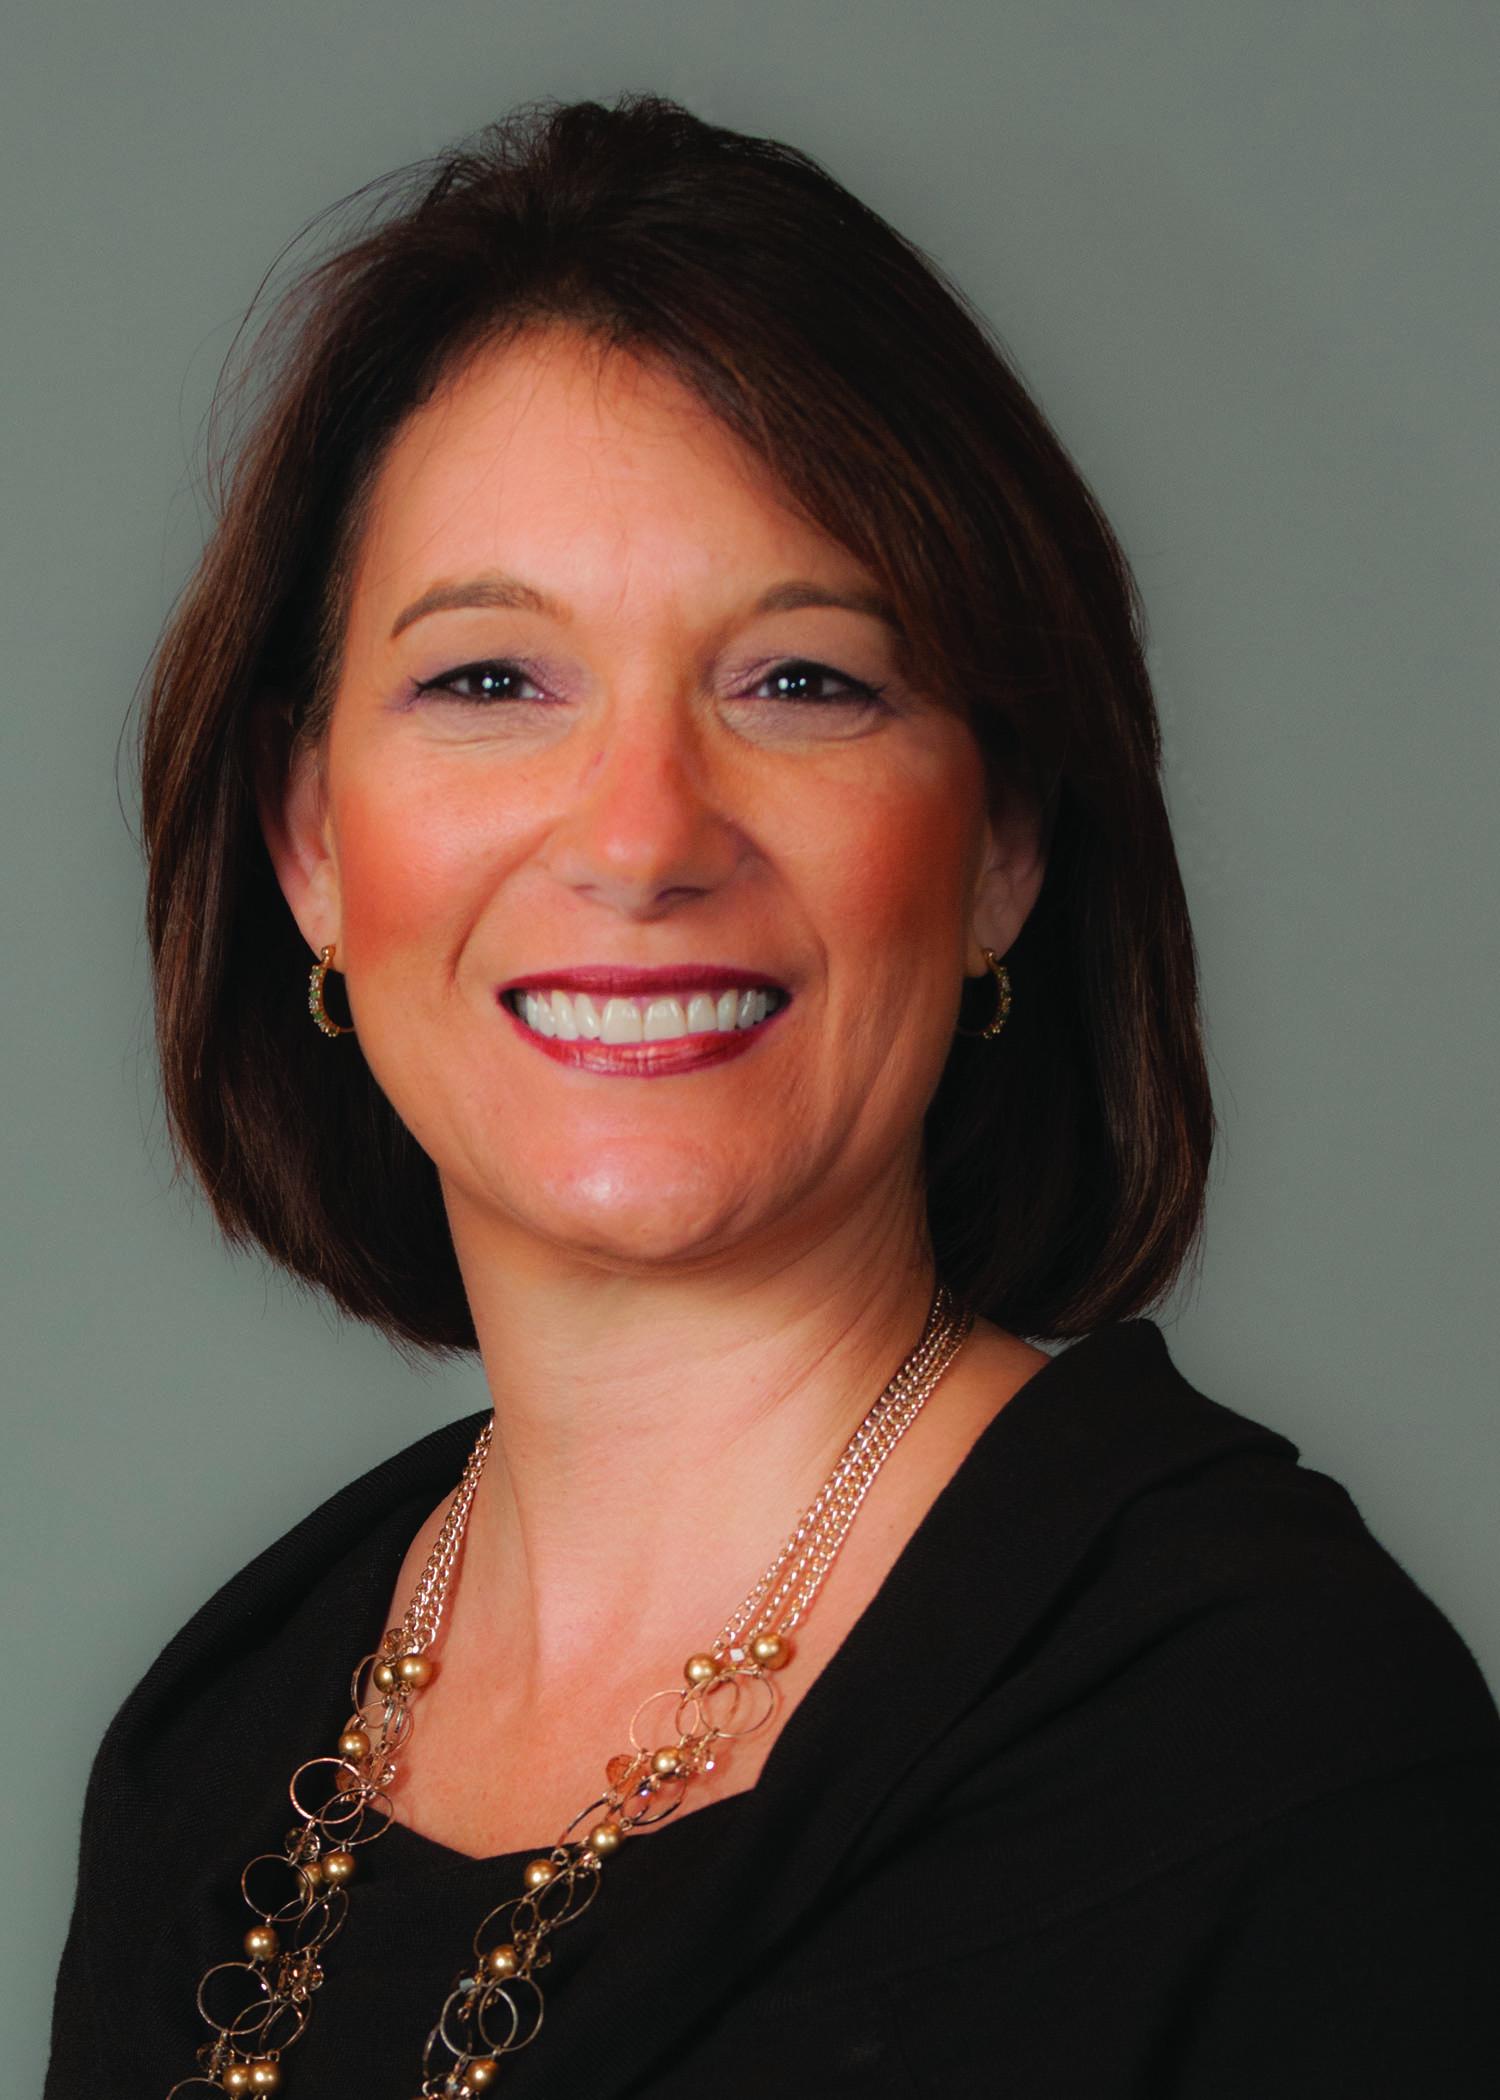 Nurse Spotlight - Christina Dempsey,MSN, CNOR, CENP